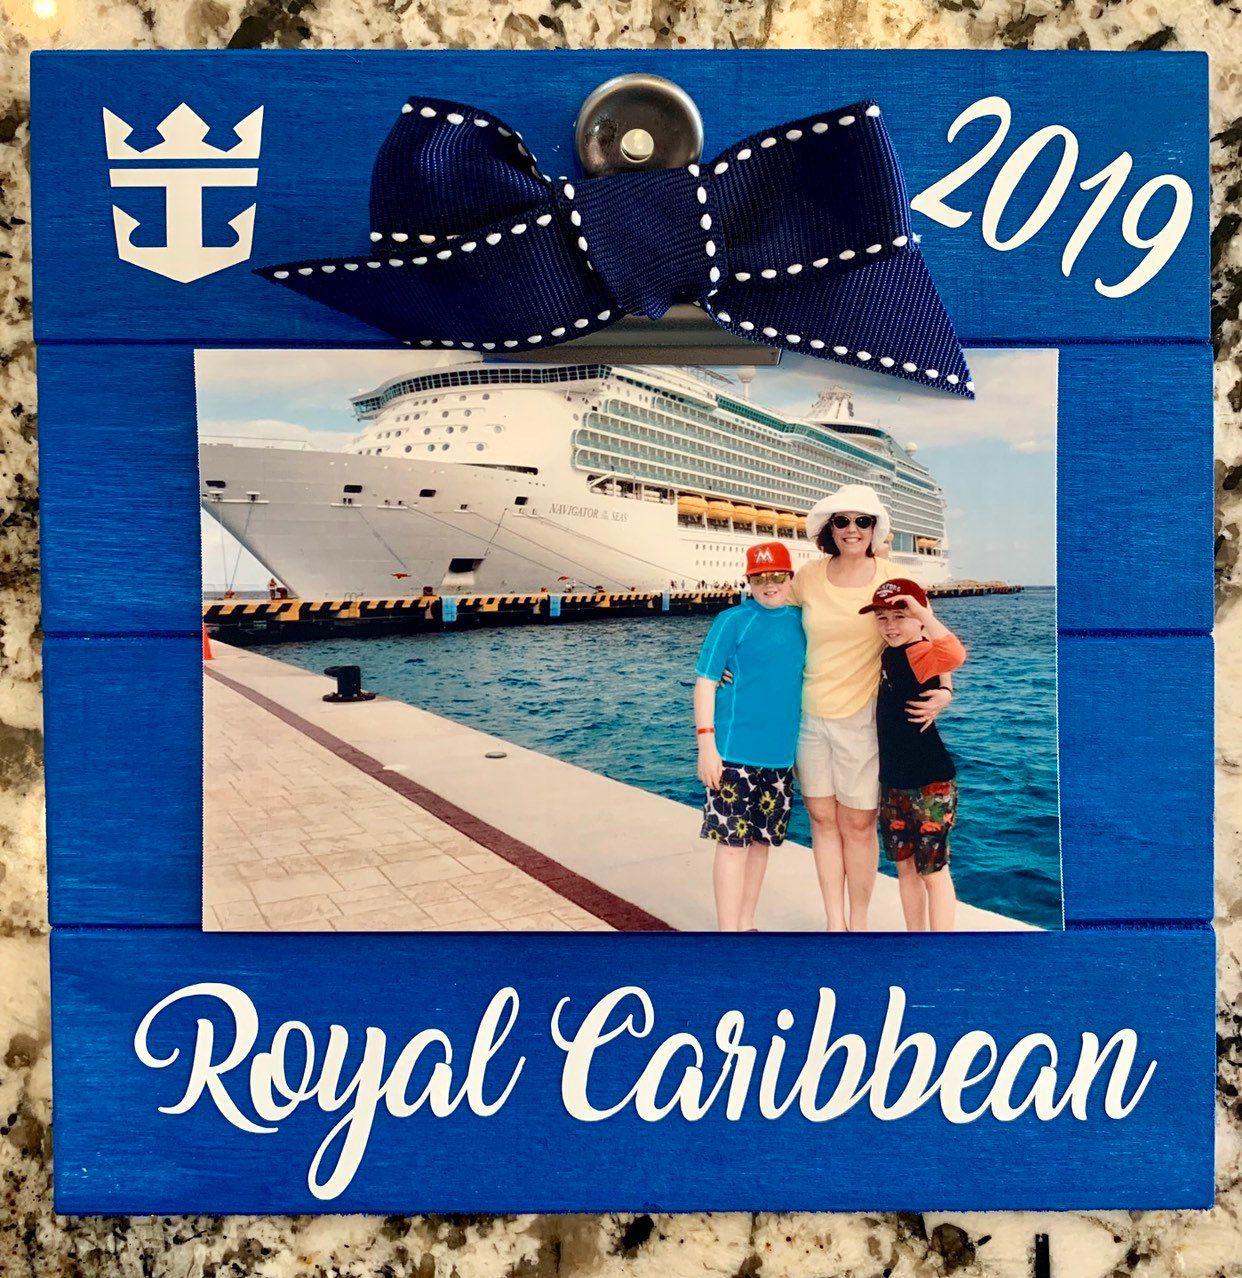 Royal Caribbean Cruise Frame Wood Frame Hand Painted In Ocean Blue Royal Caribbean Cruise Royal Caribbean Cruise Ship Caribbean Cruise